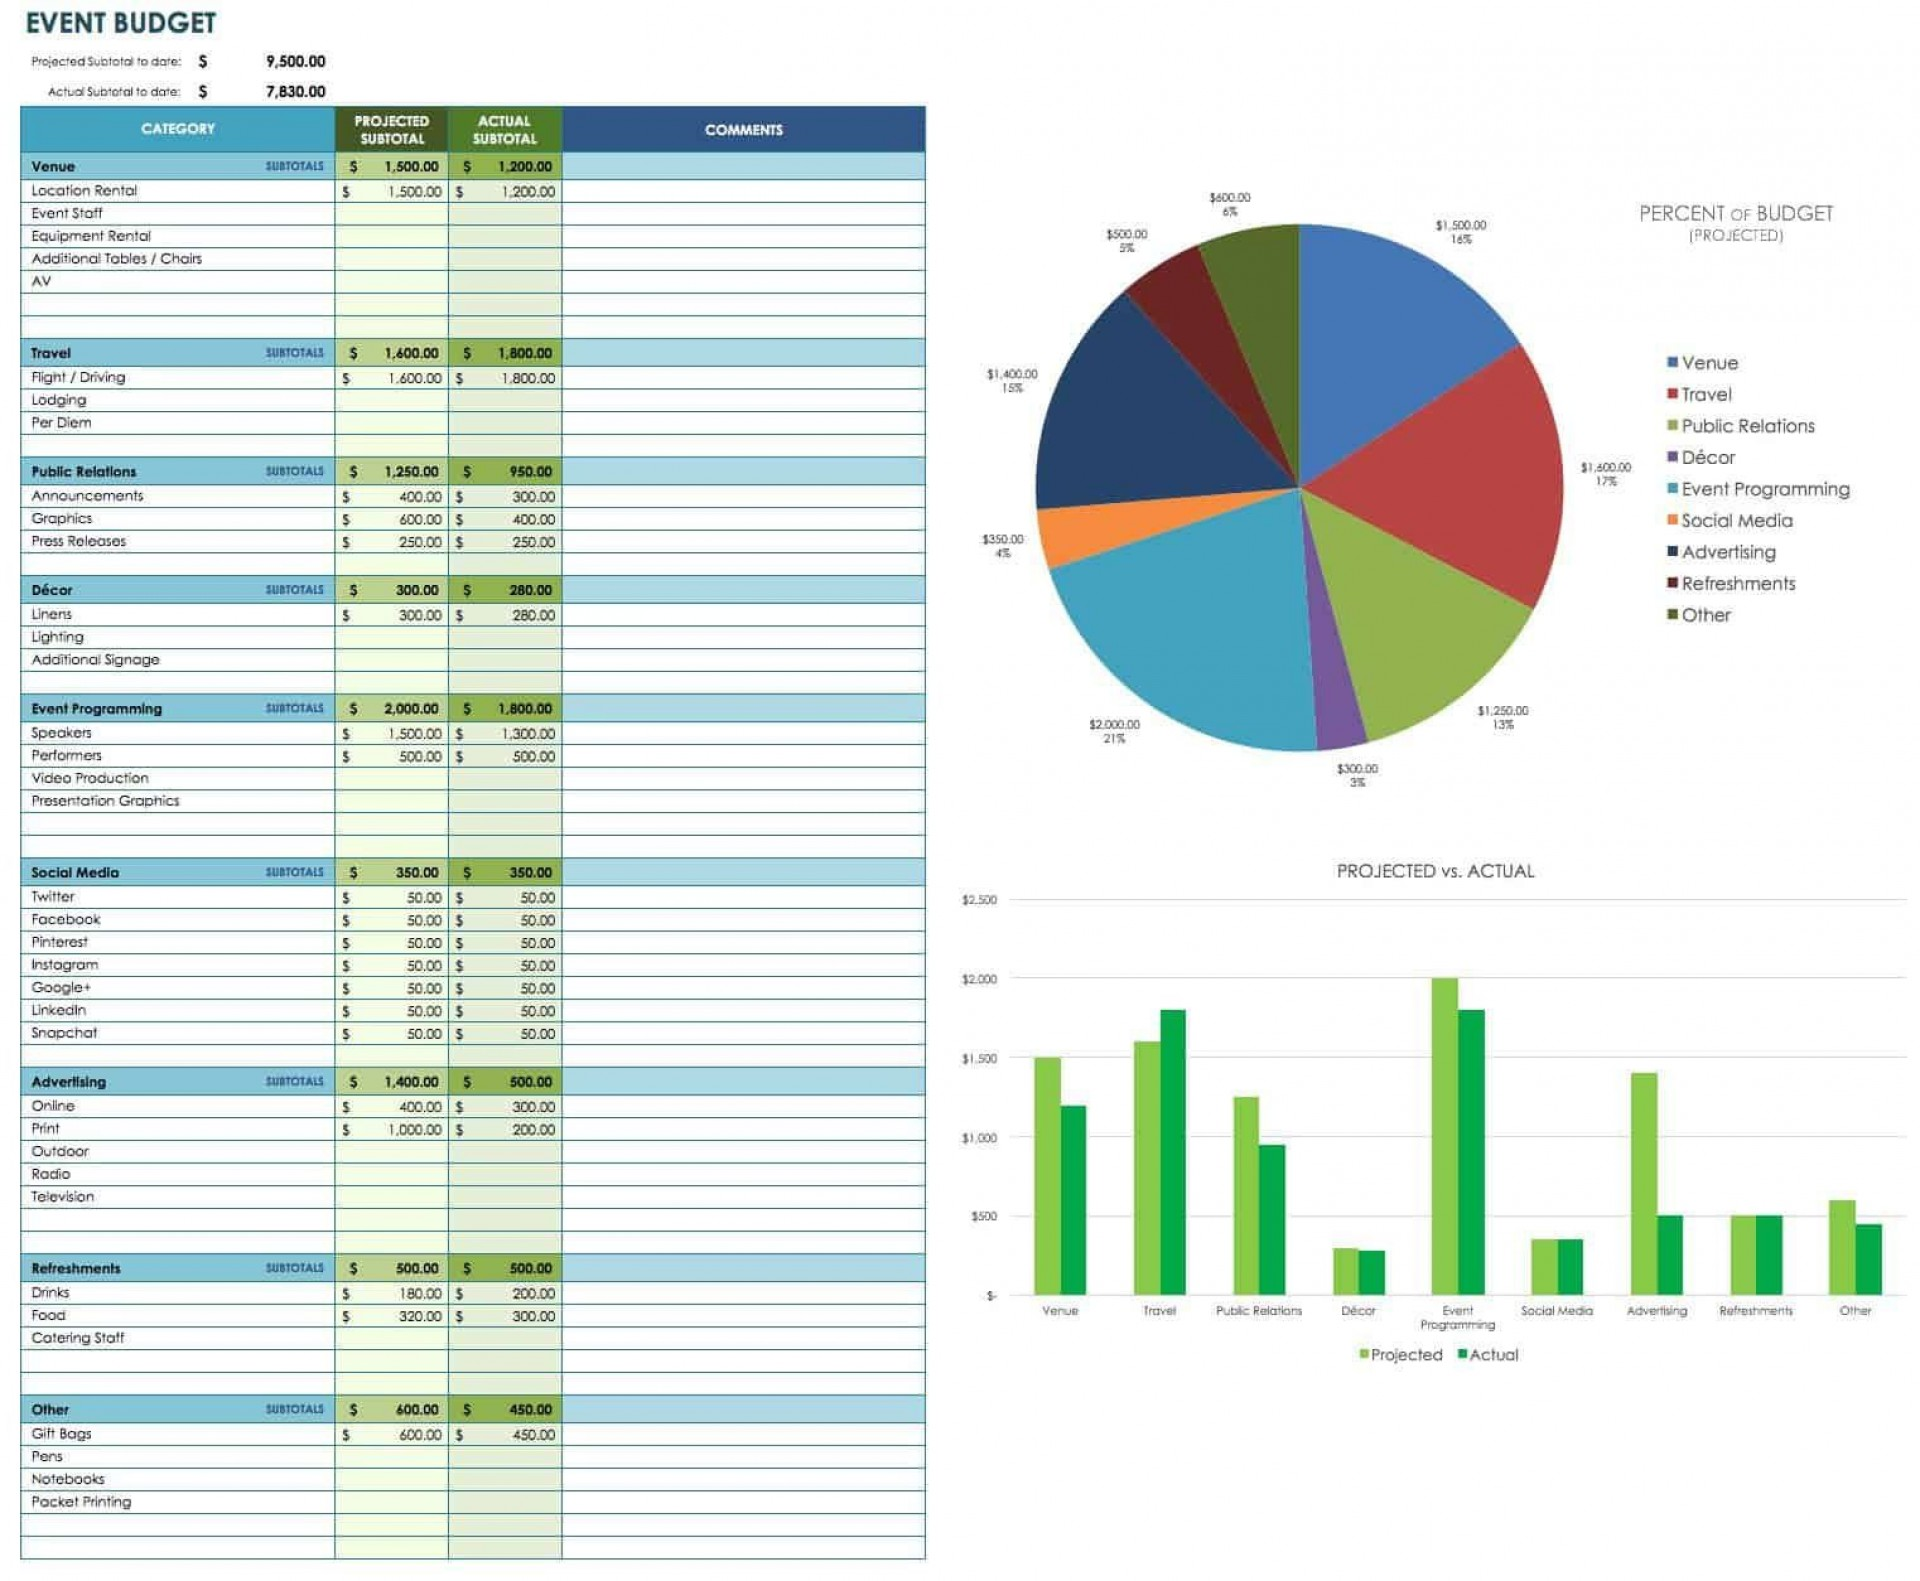 009 Surprising Line Item Budget Template Excel High Resolution 1920